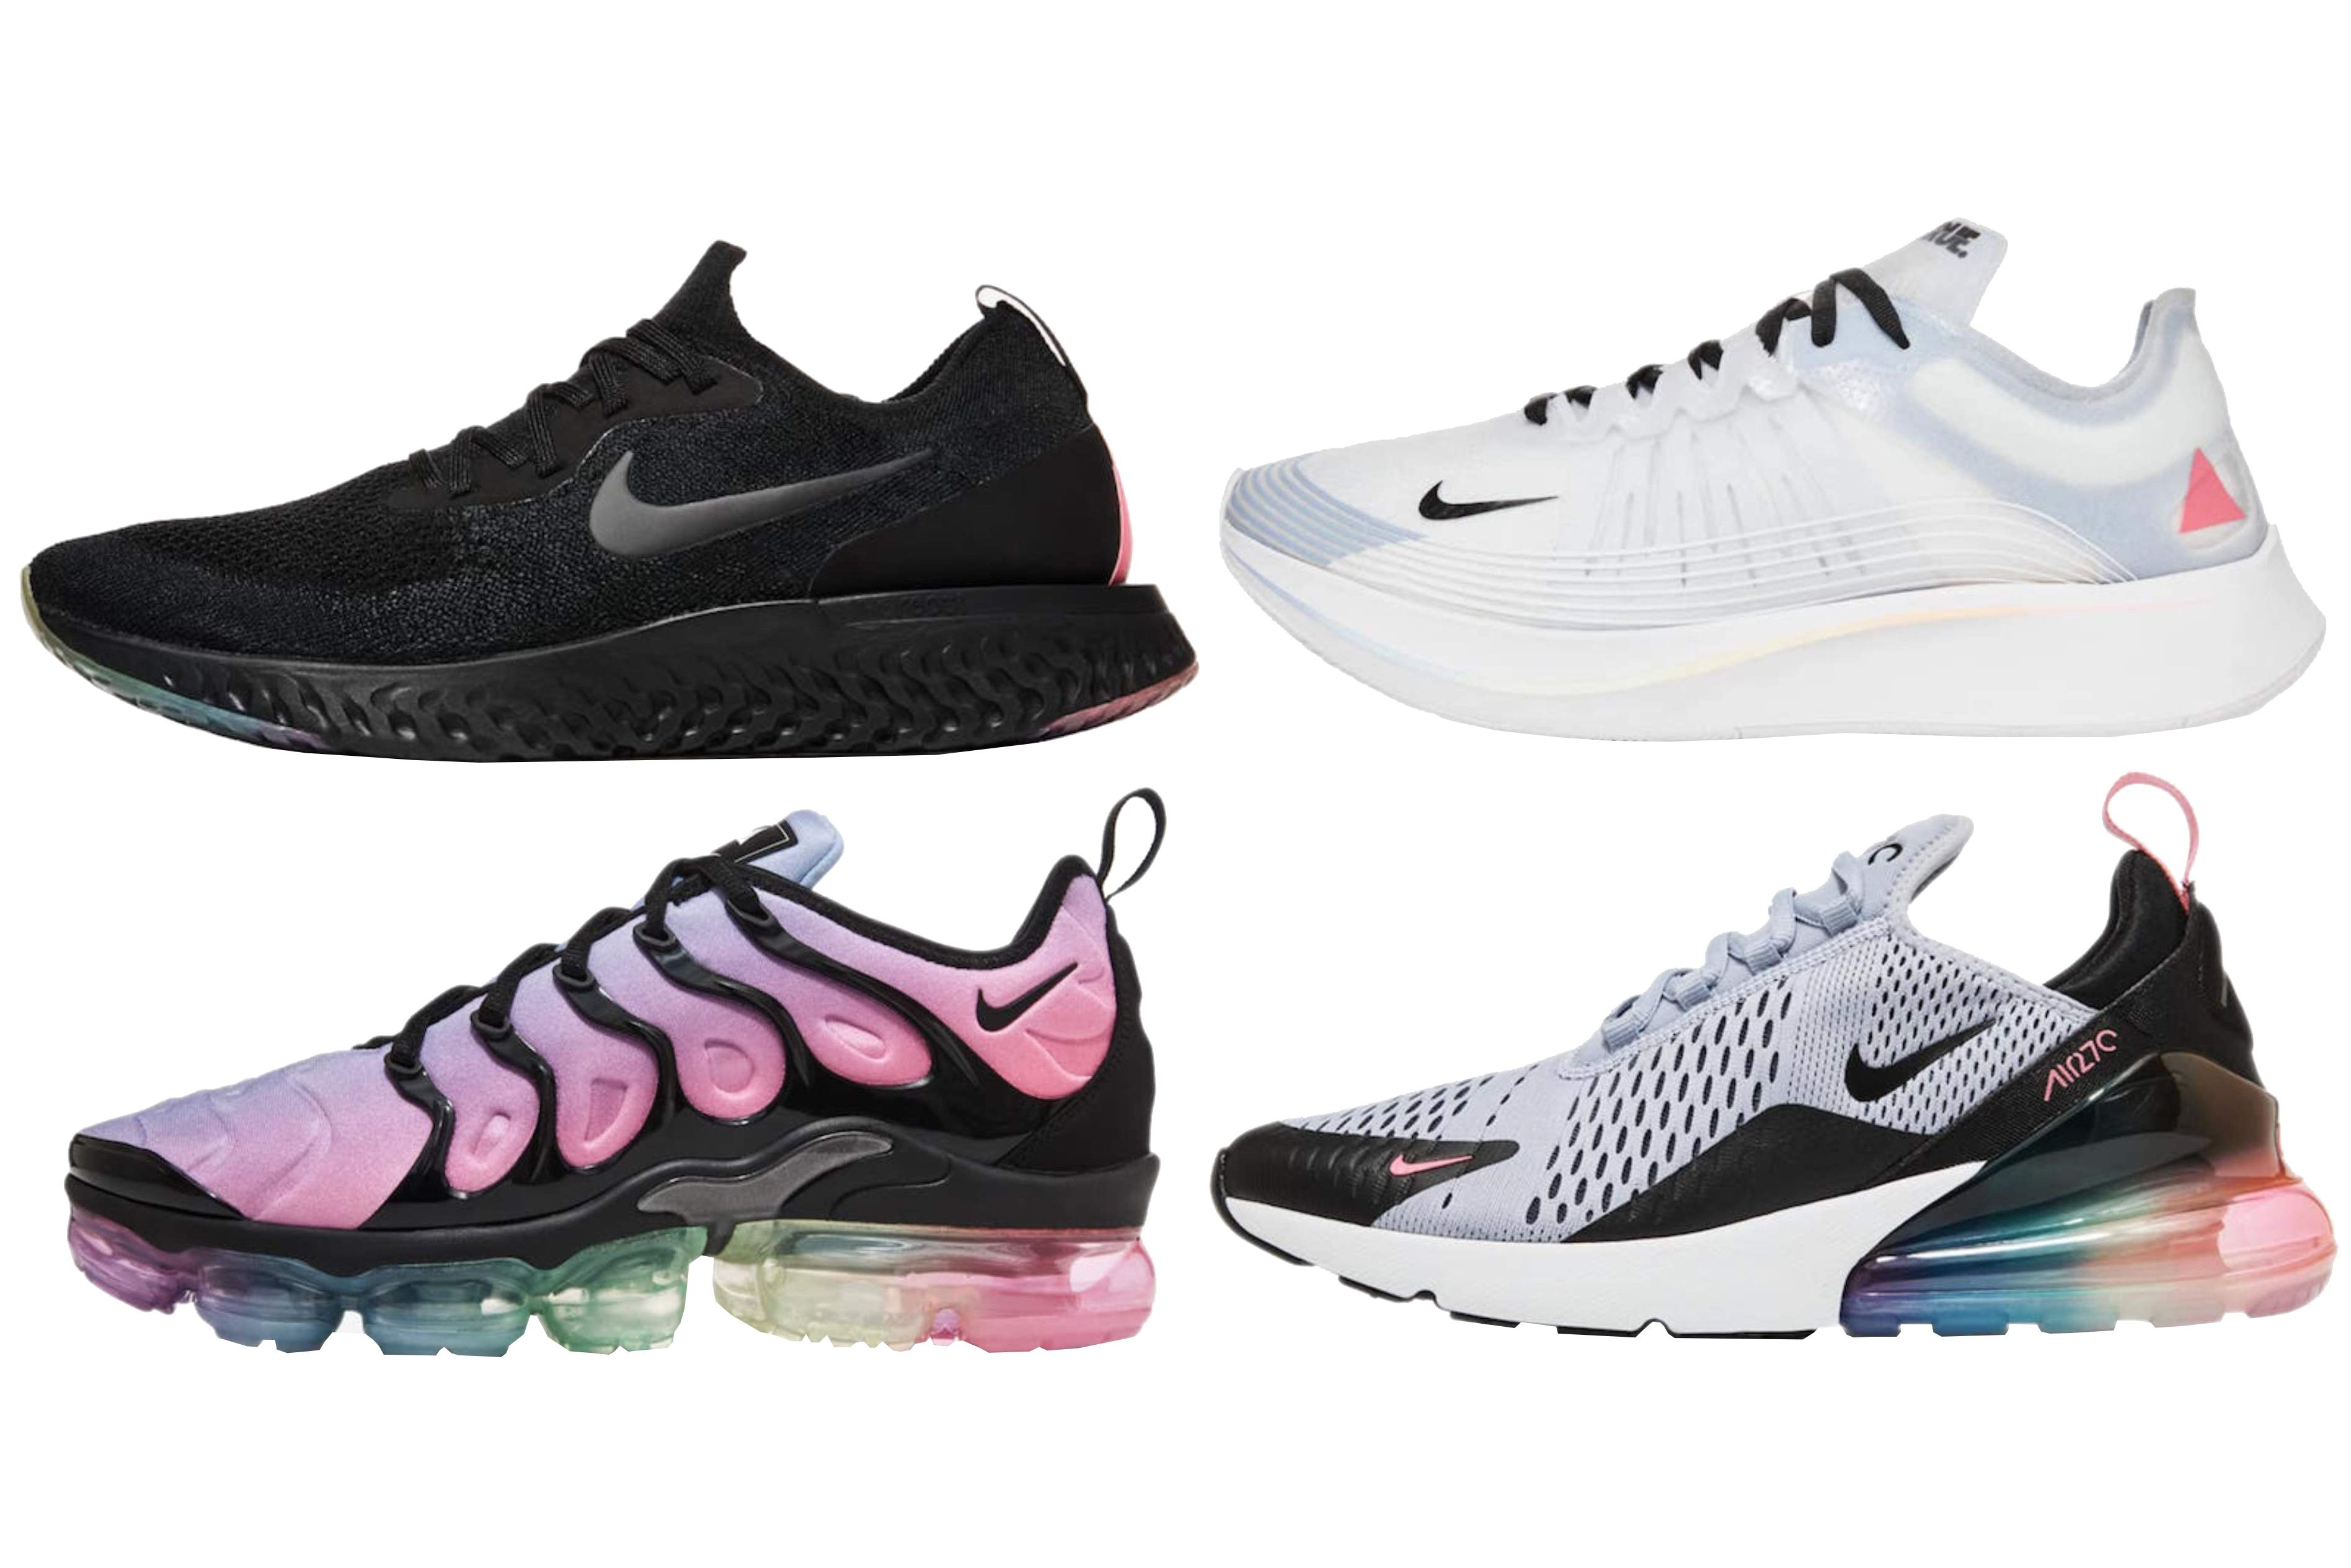 67 Best Sneakers of 2018 Coolest Sneakers to Buy in 2018